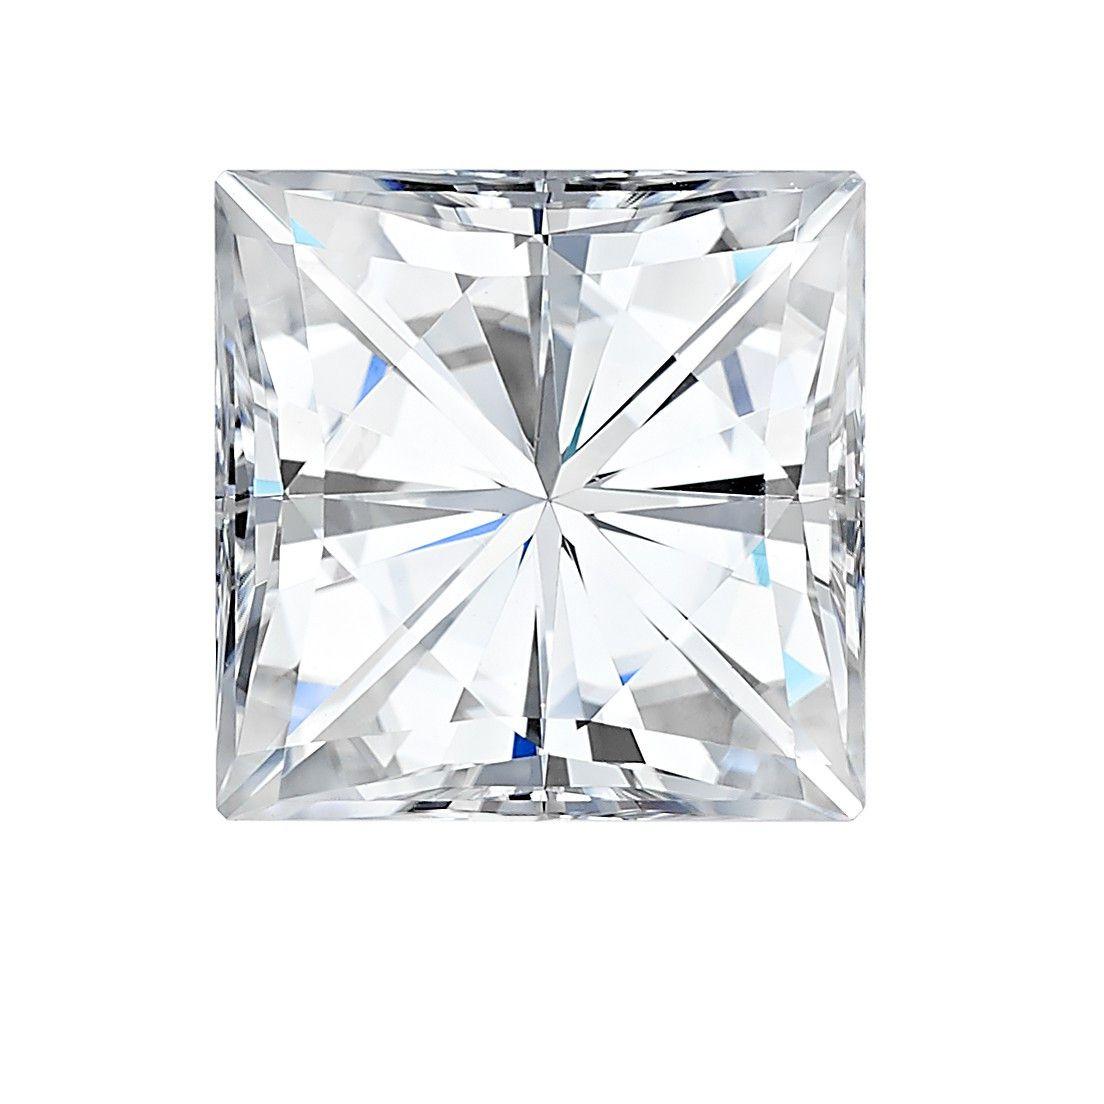 Charles & Colvard (USA) Square Brilliant 4.5mm Moissanite Diamond 0.60ct Equivalent Weight